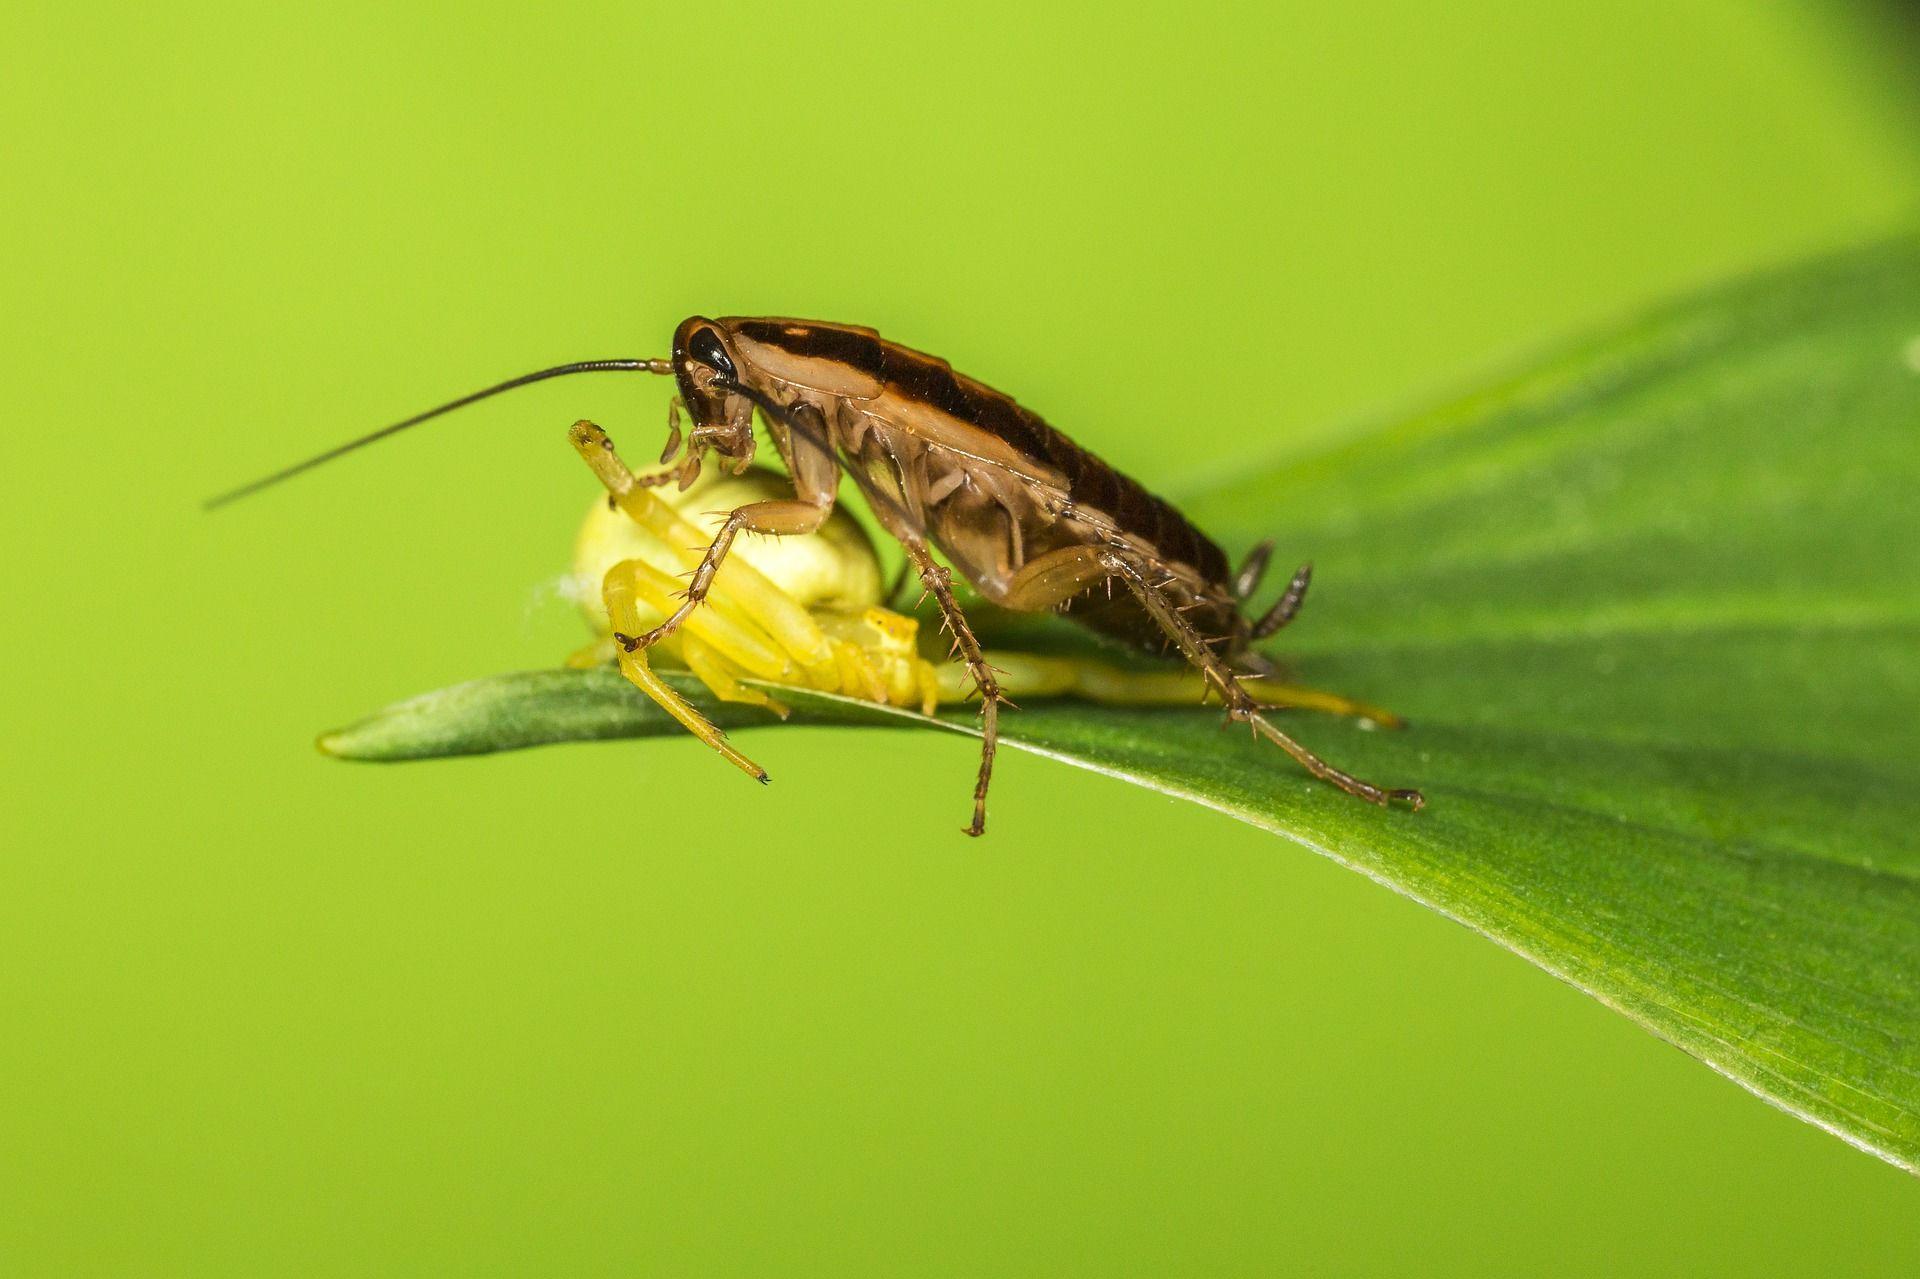 Картинки маленького домашнего таракана